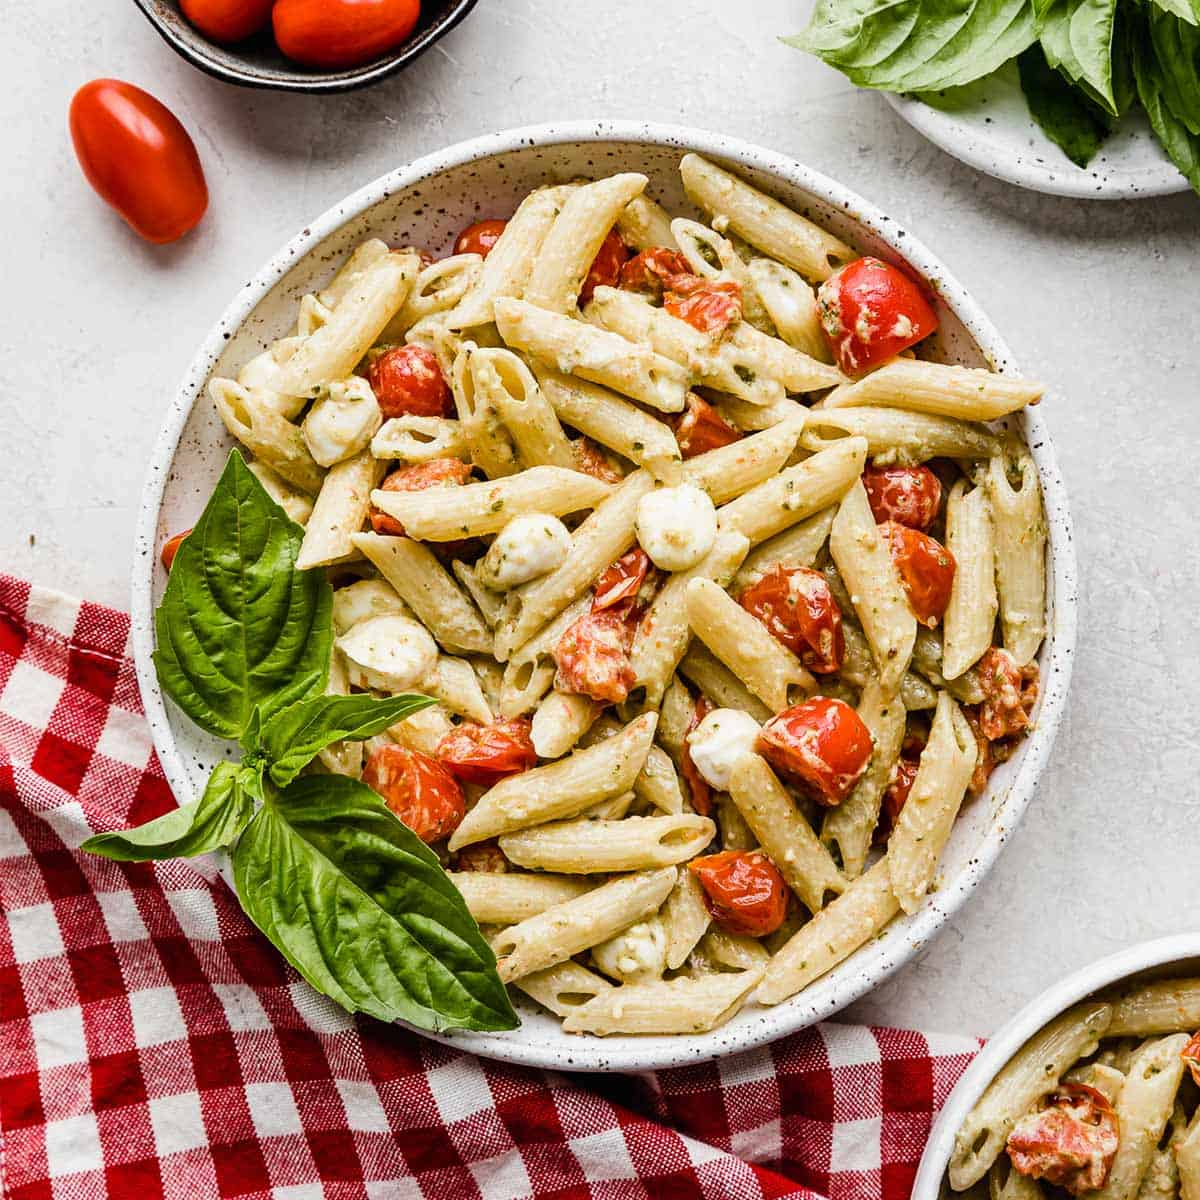 A bowl of creamy pesto pasta with tomatoes and mozzarella balls.